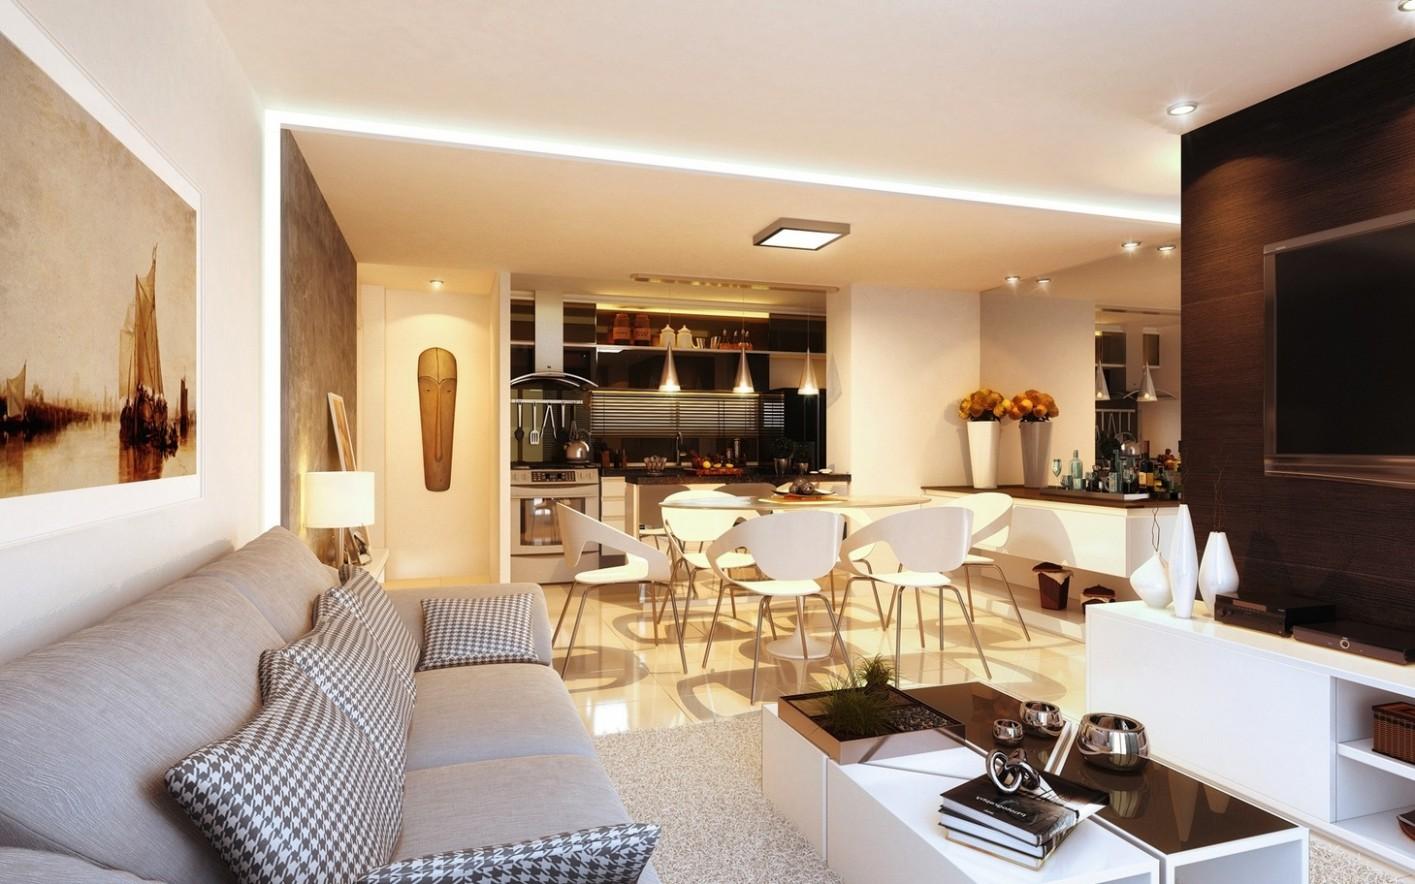 12 Open Concept Apartment Interiors For Inspiration - Apartment House Design Ideas